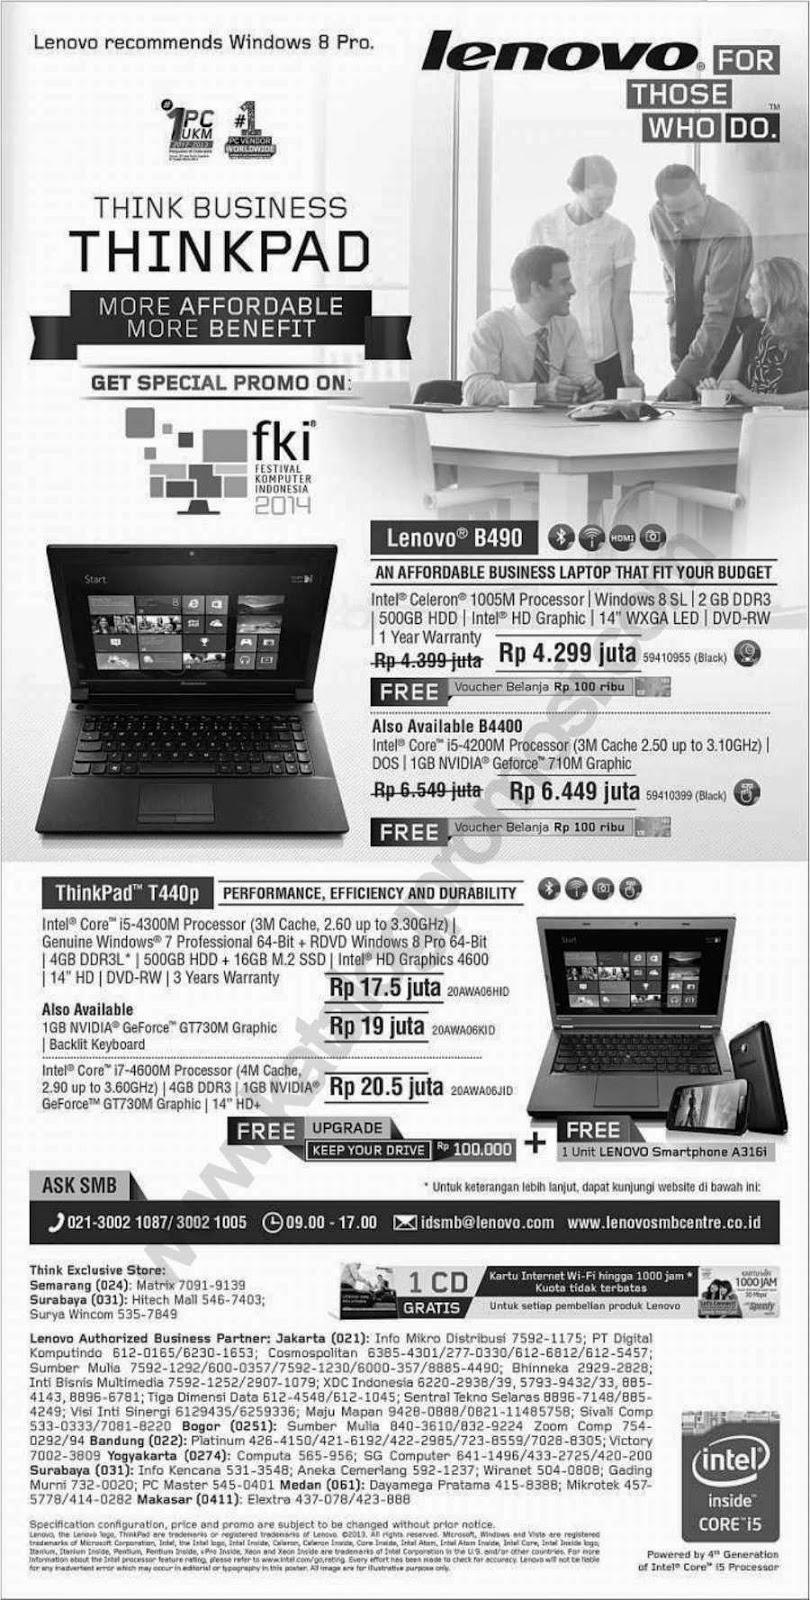 Daftar Promo Lenovo di ICS 2014